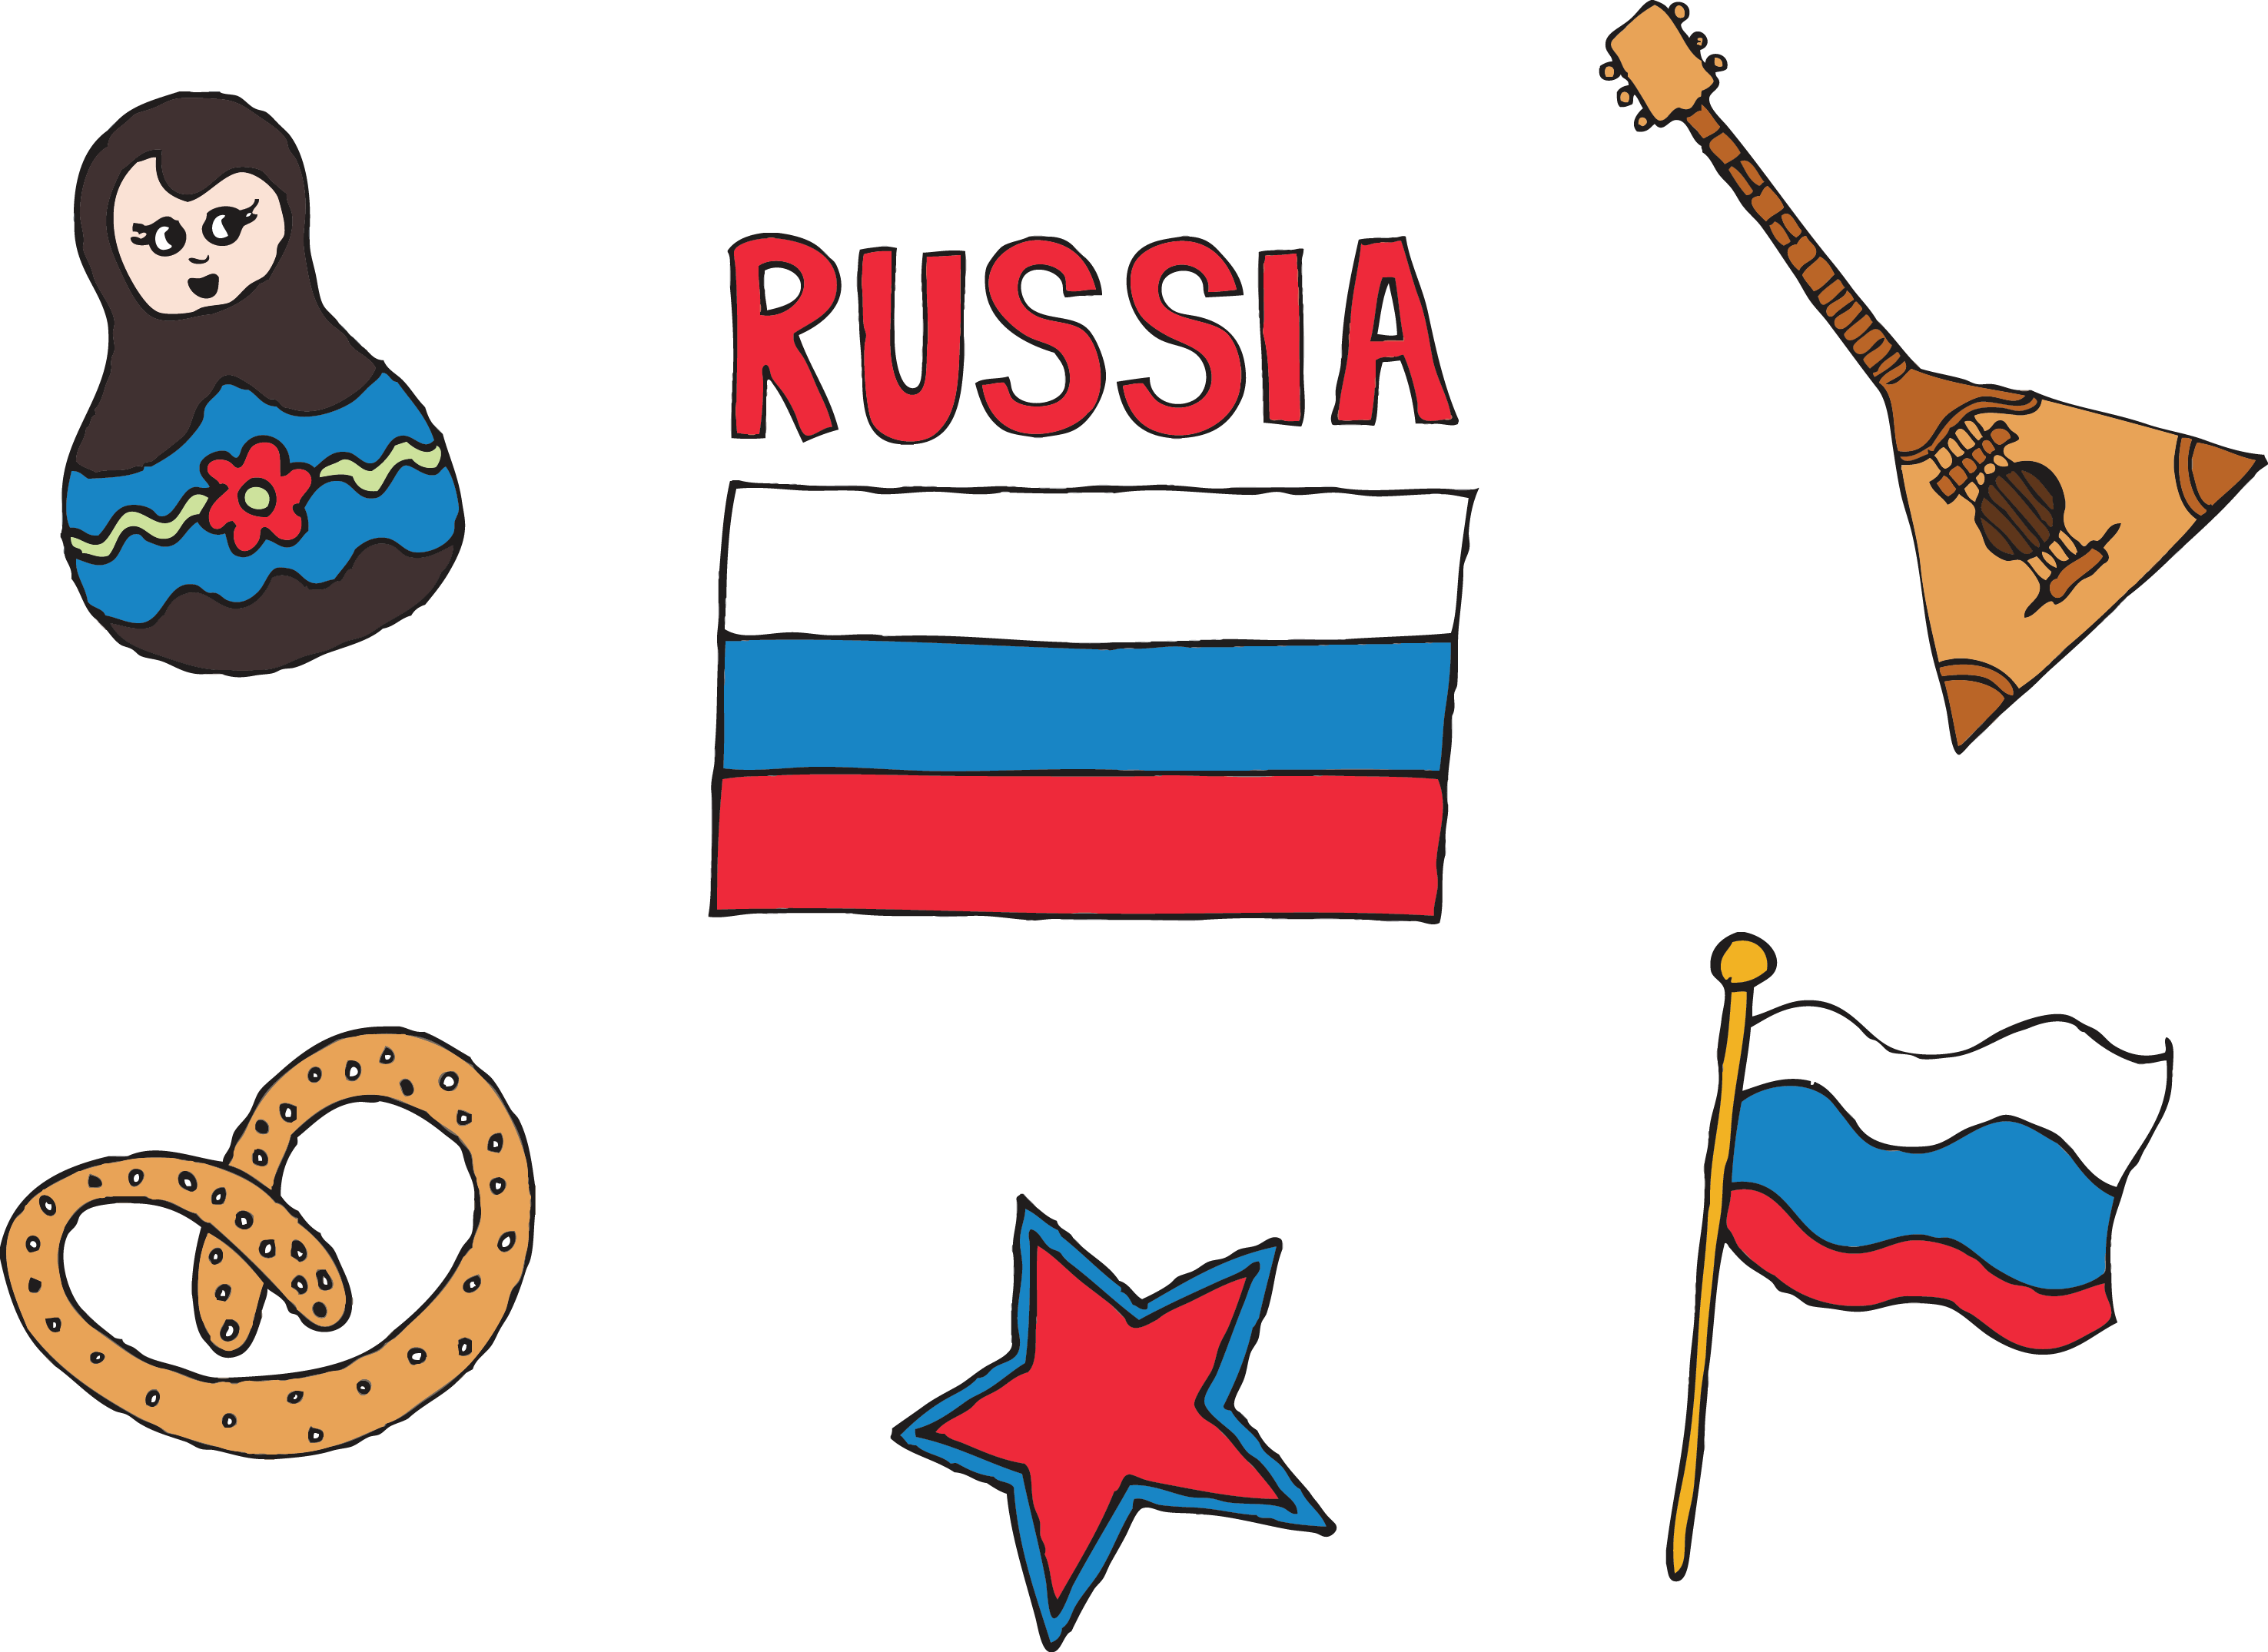 Russian symbols PNG Image